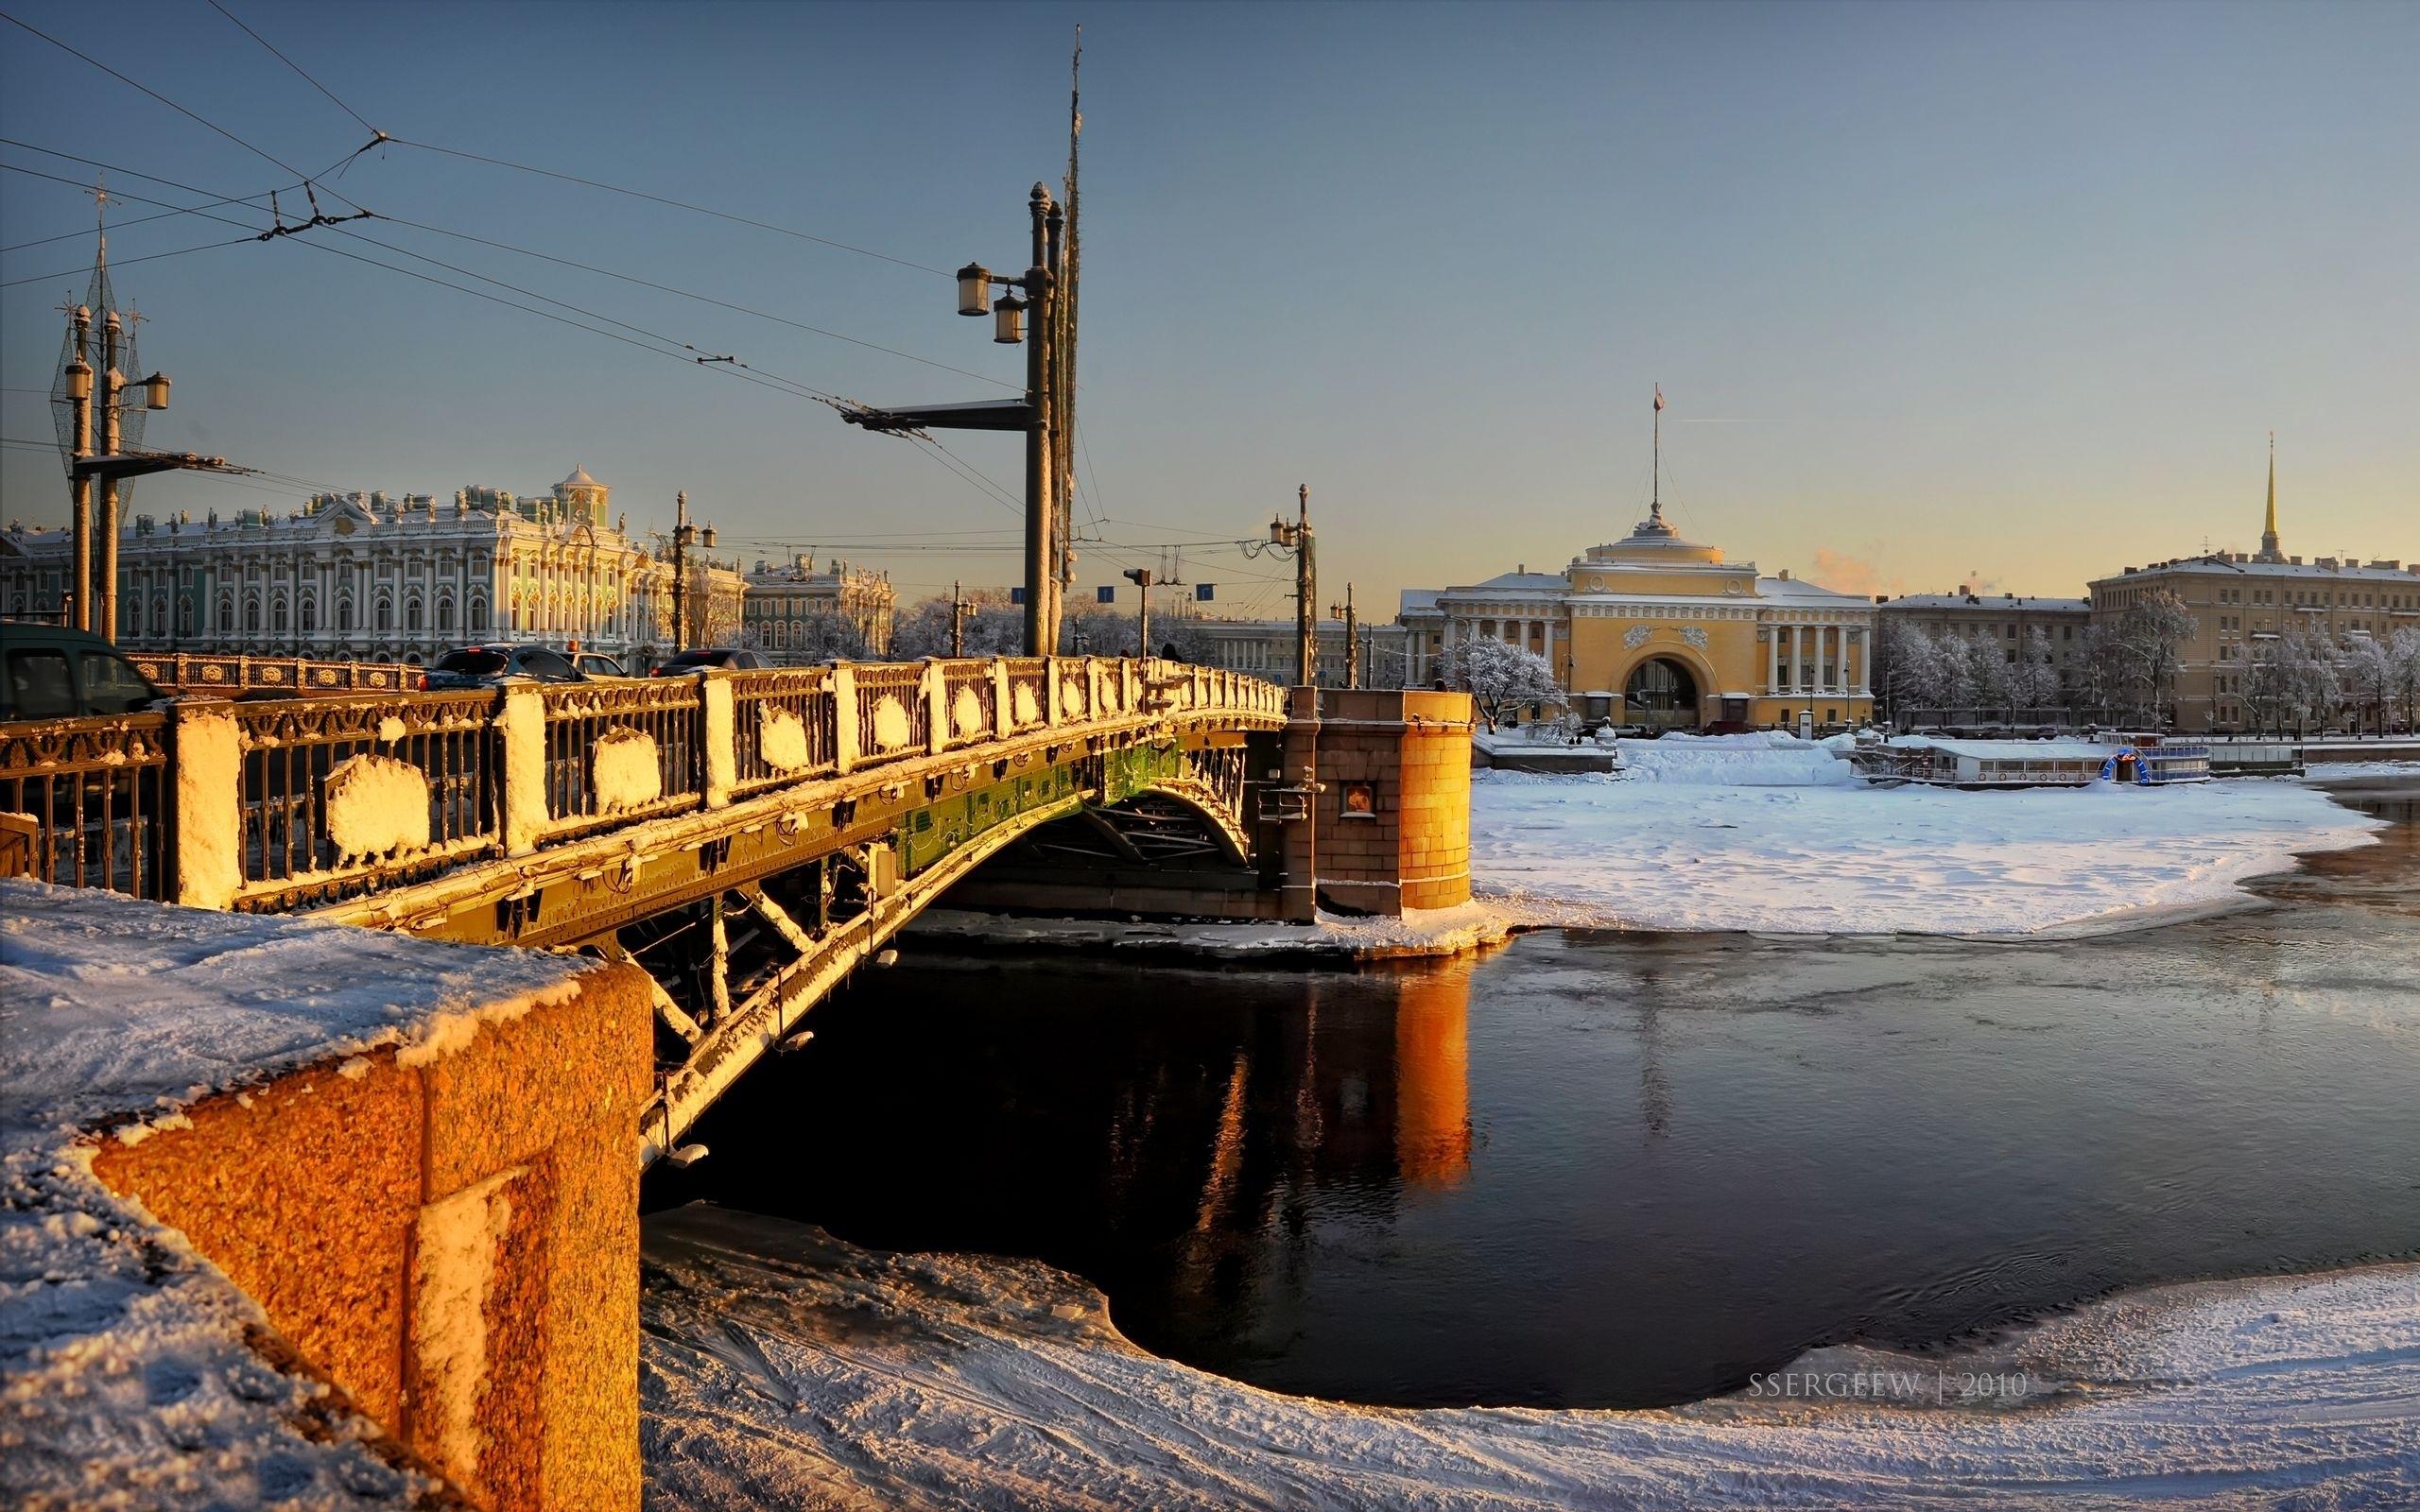 Baggrunde Palads Bro Vinterpaladset Sankt Petersborg